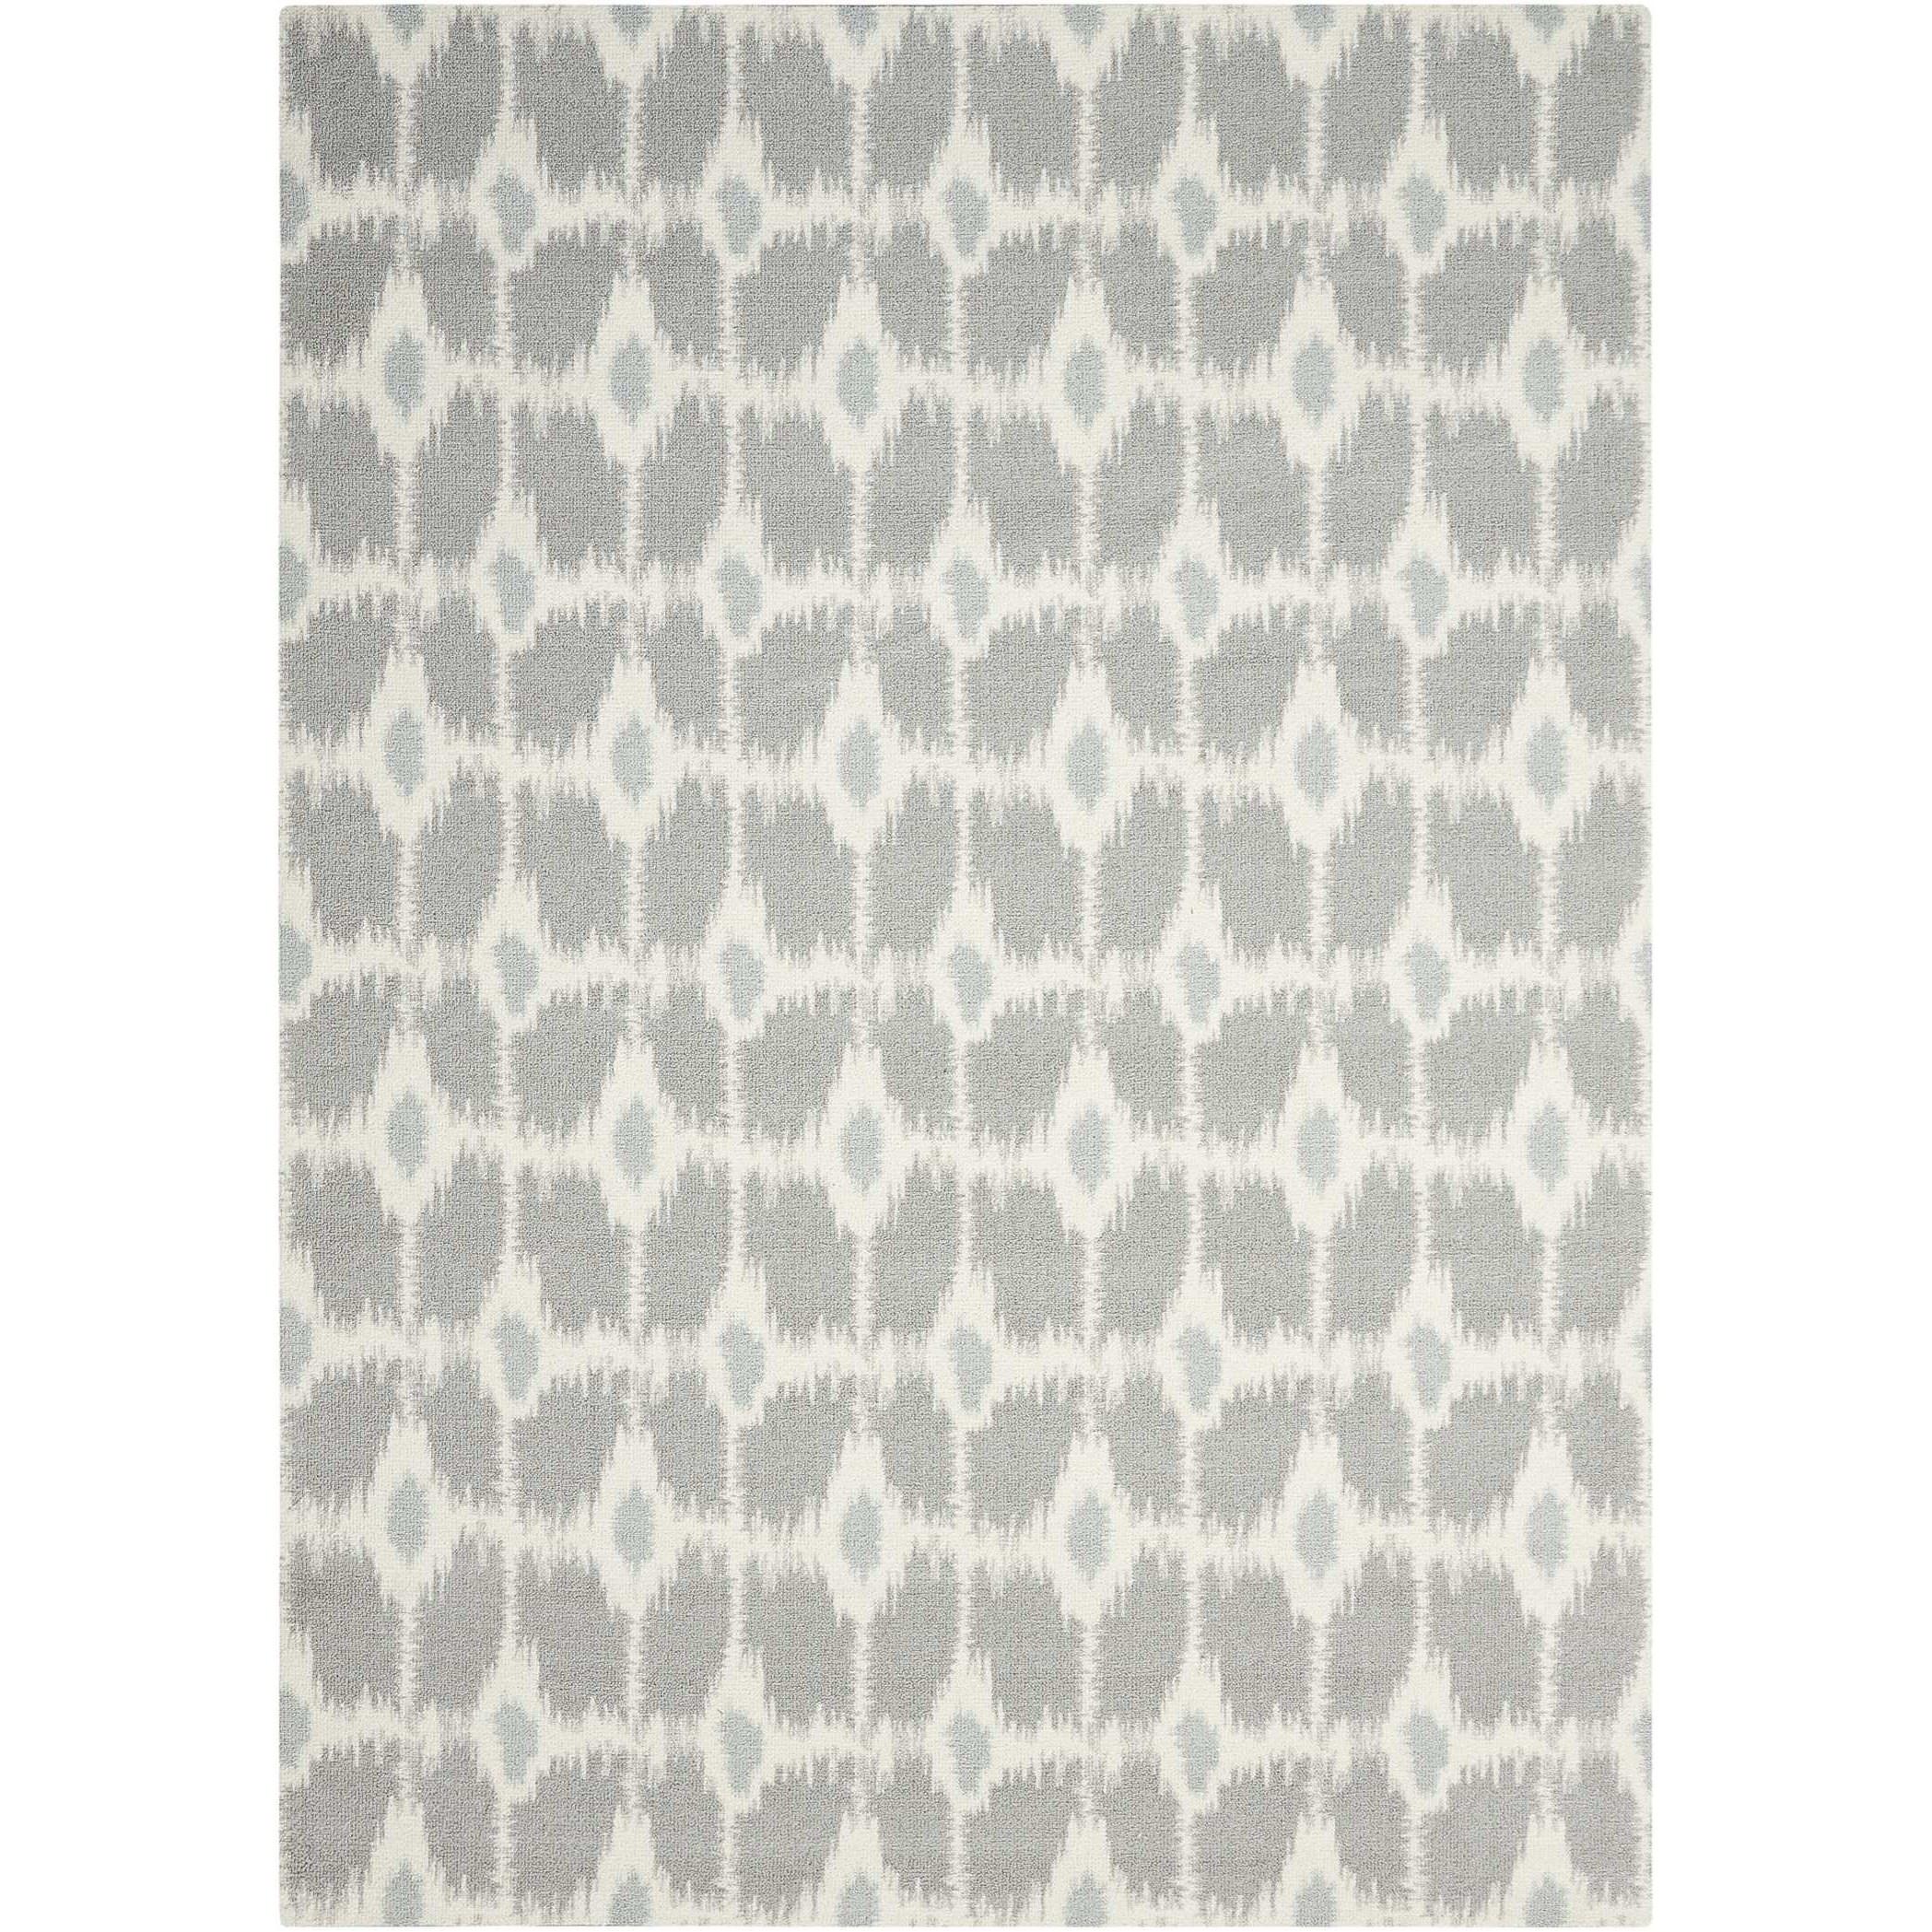 Nourison Enhance 4' x 6' Grey Rectangle Rug - Item Number: EN199 GRY 4X6